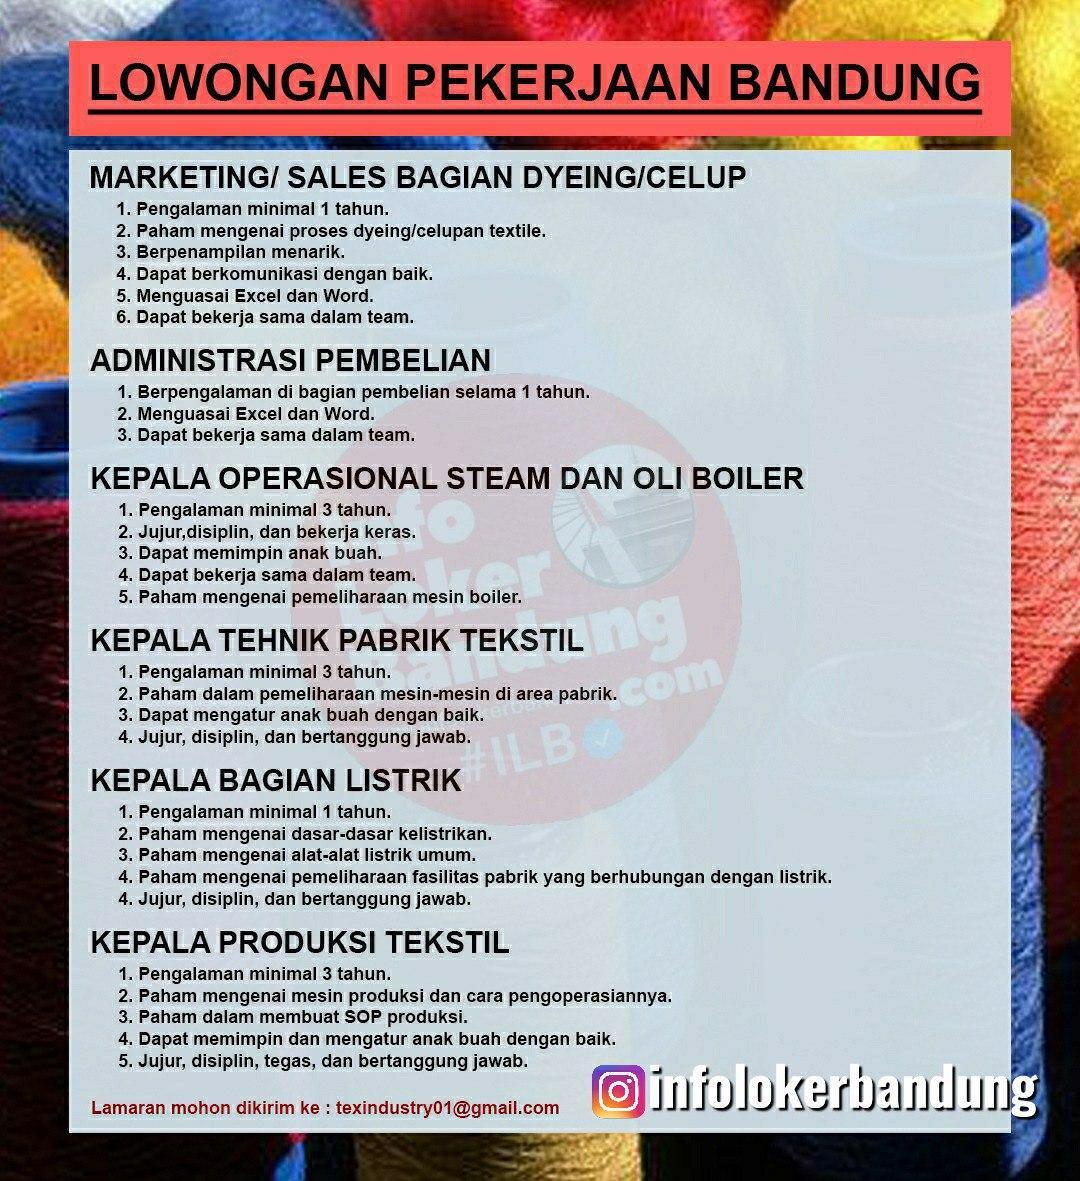 Lowongan Kerja Perusahaan Textile Bandung Juni 2020